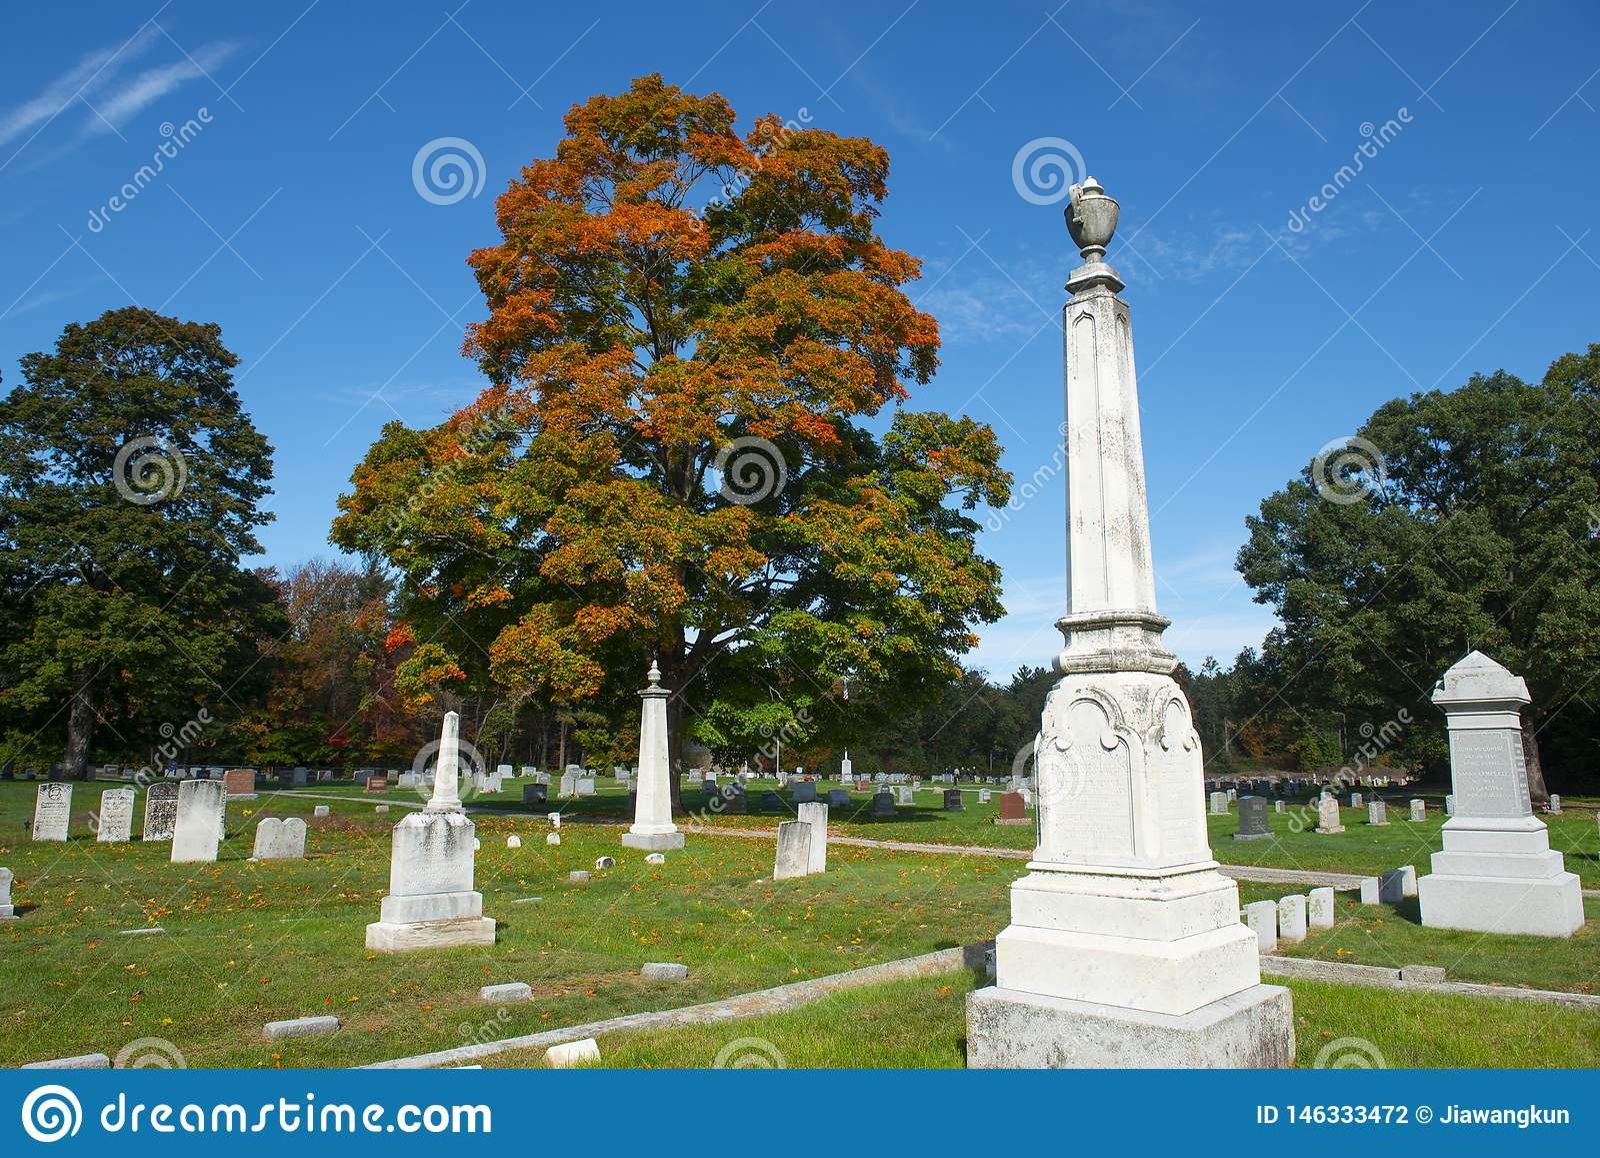 Ultimo cimitero di resto in Merrimack, NH, U.S.A.